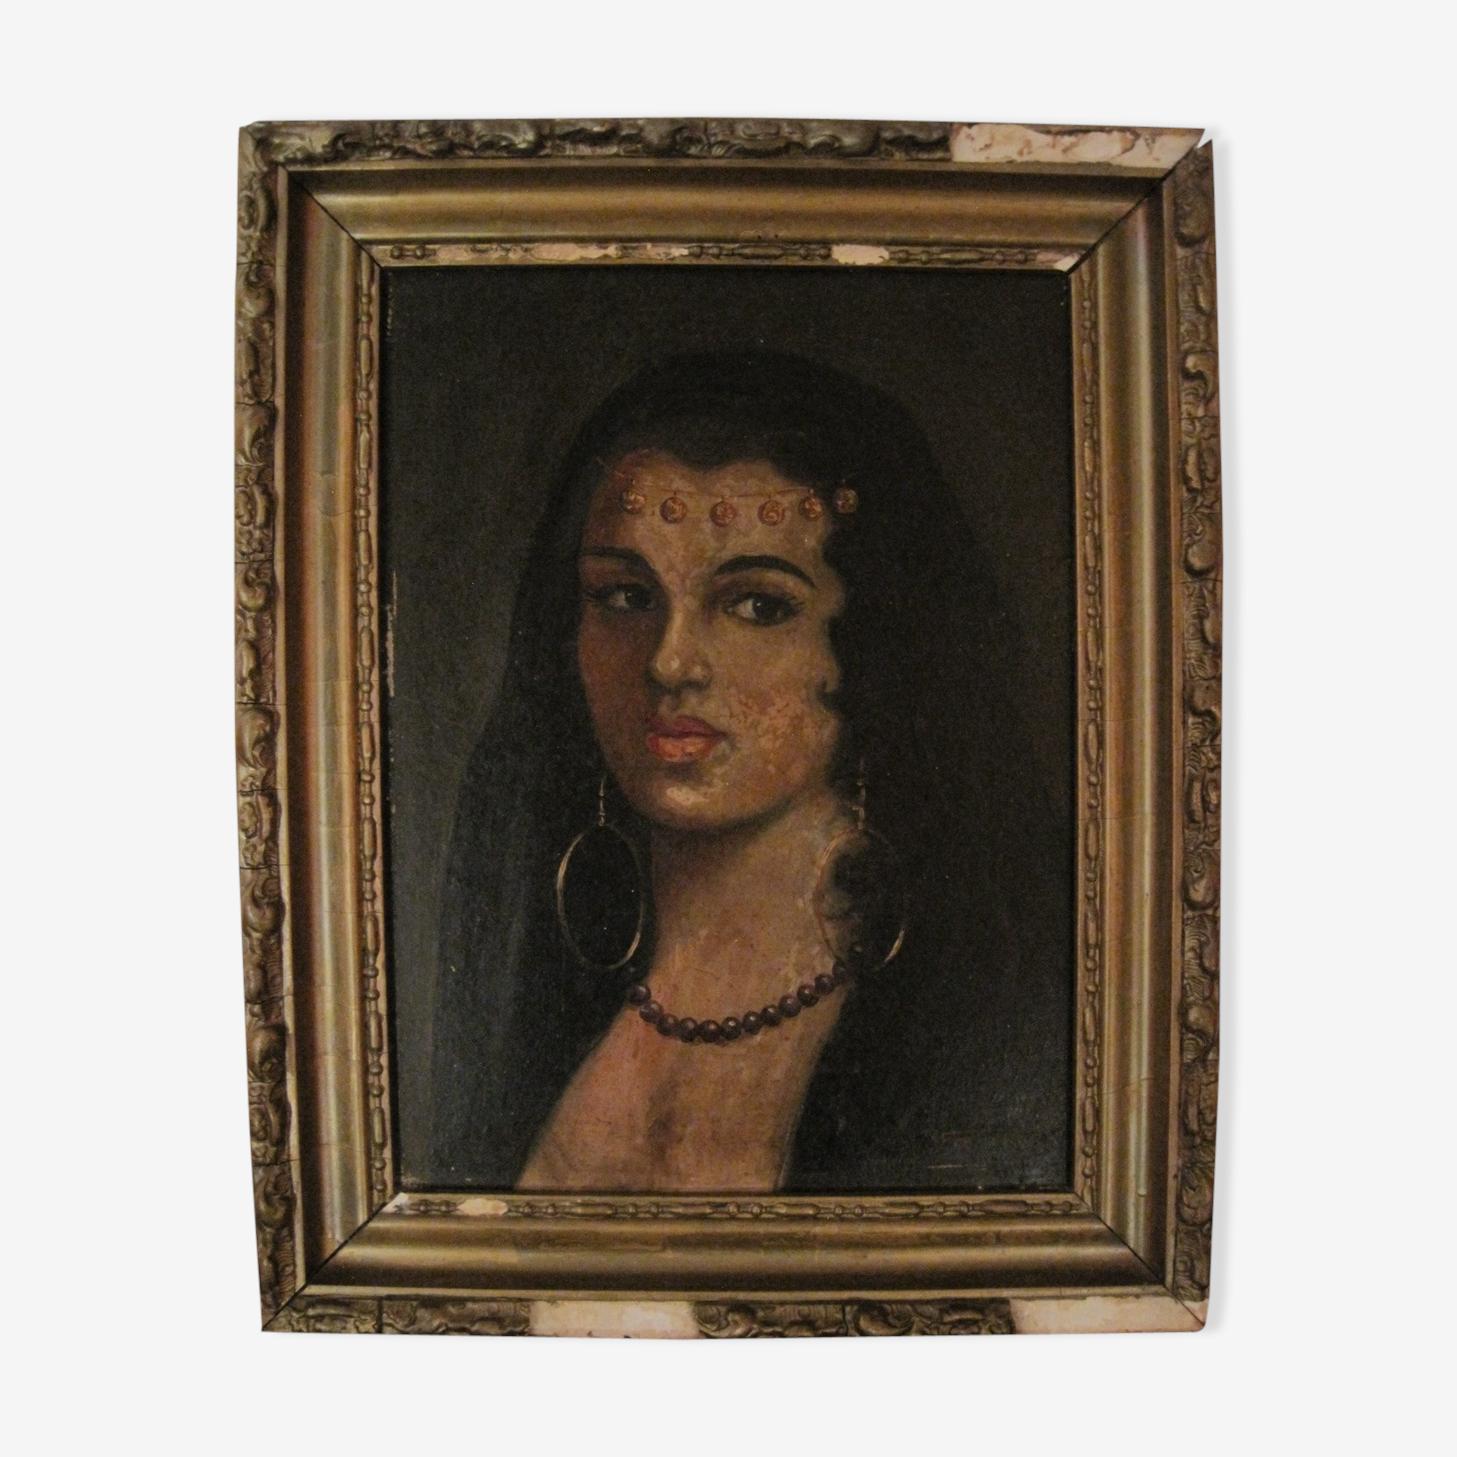 Portrait jeune femme orientale peinture huile signé XlXe